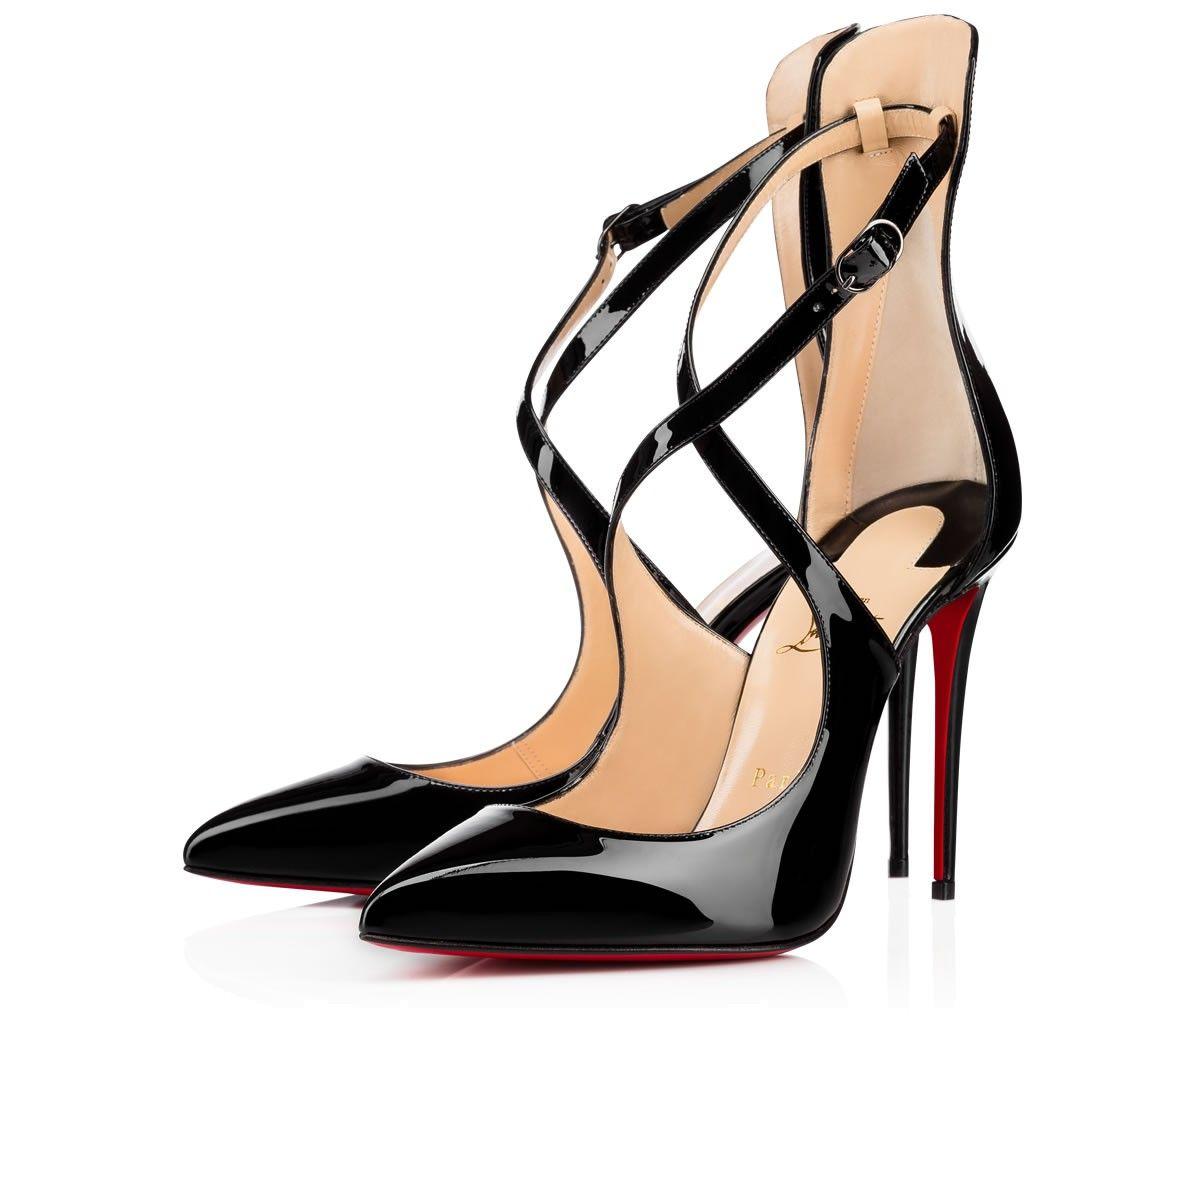 bottes femme christian louboutin